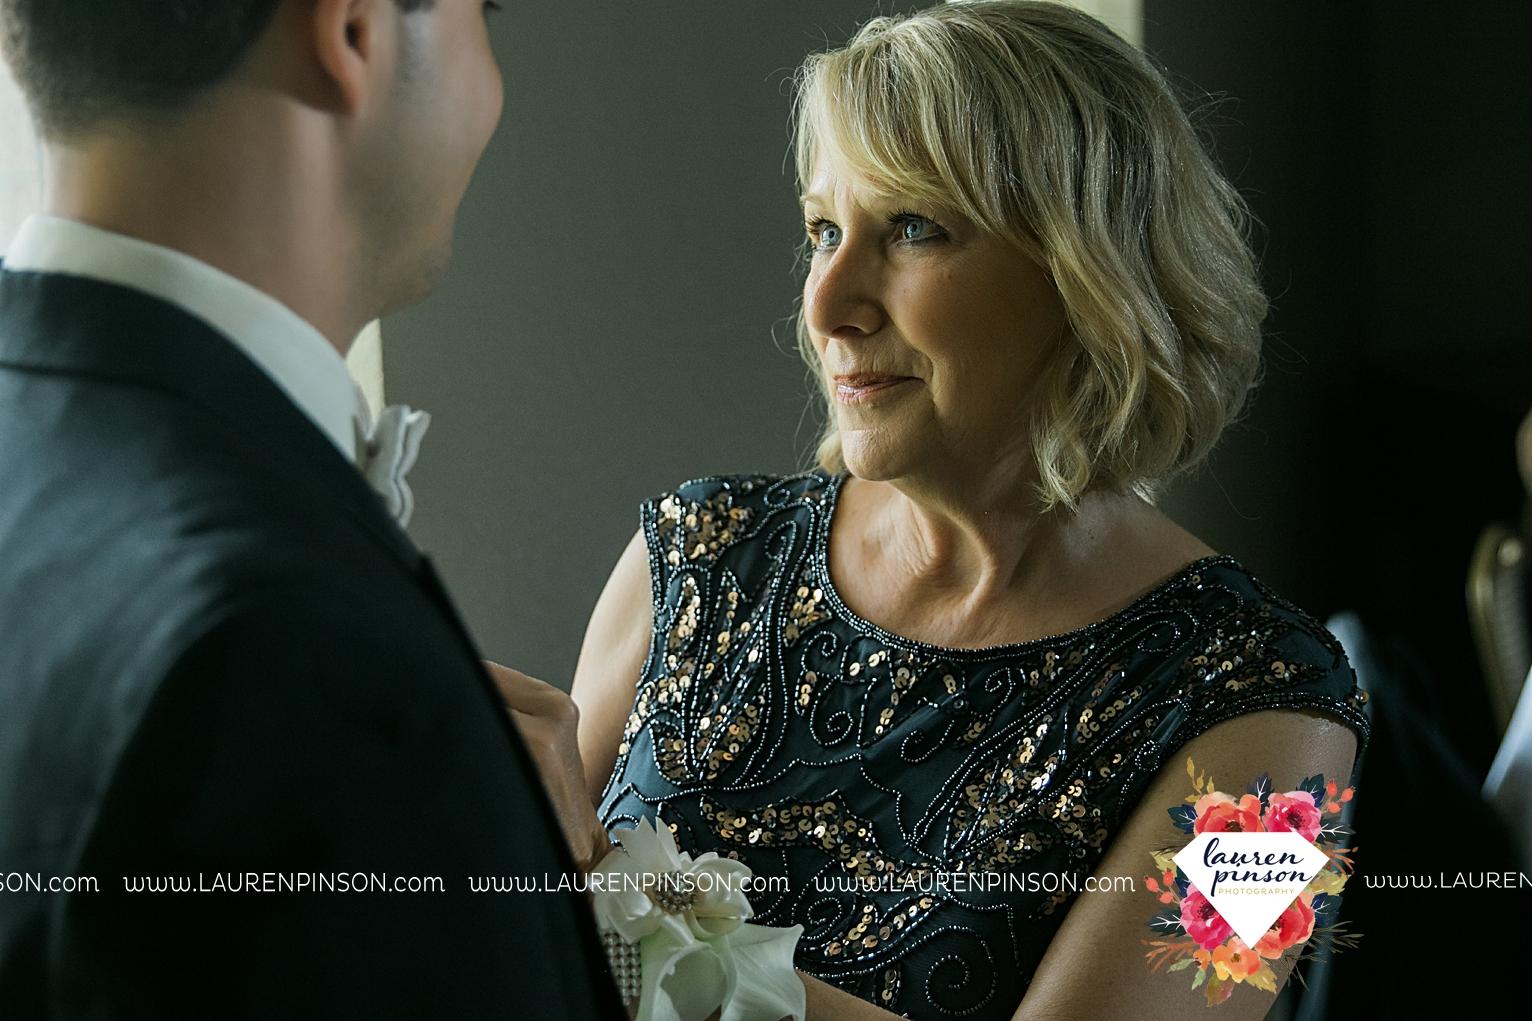 wichita-falls-texas-wedding-photographer-the-forum-by-the-kemp-mayfield-events-ulta-gold-glitter_2859.jpg